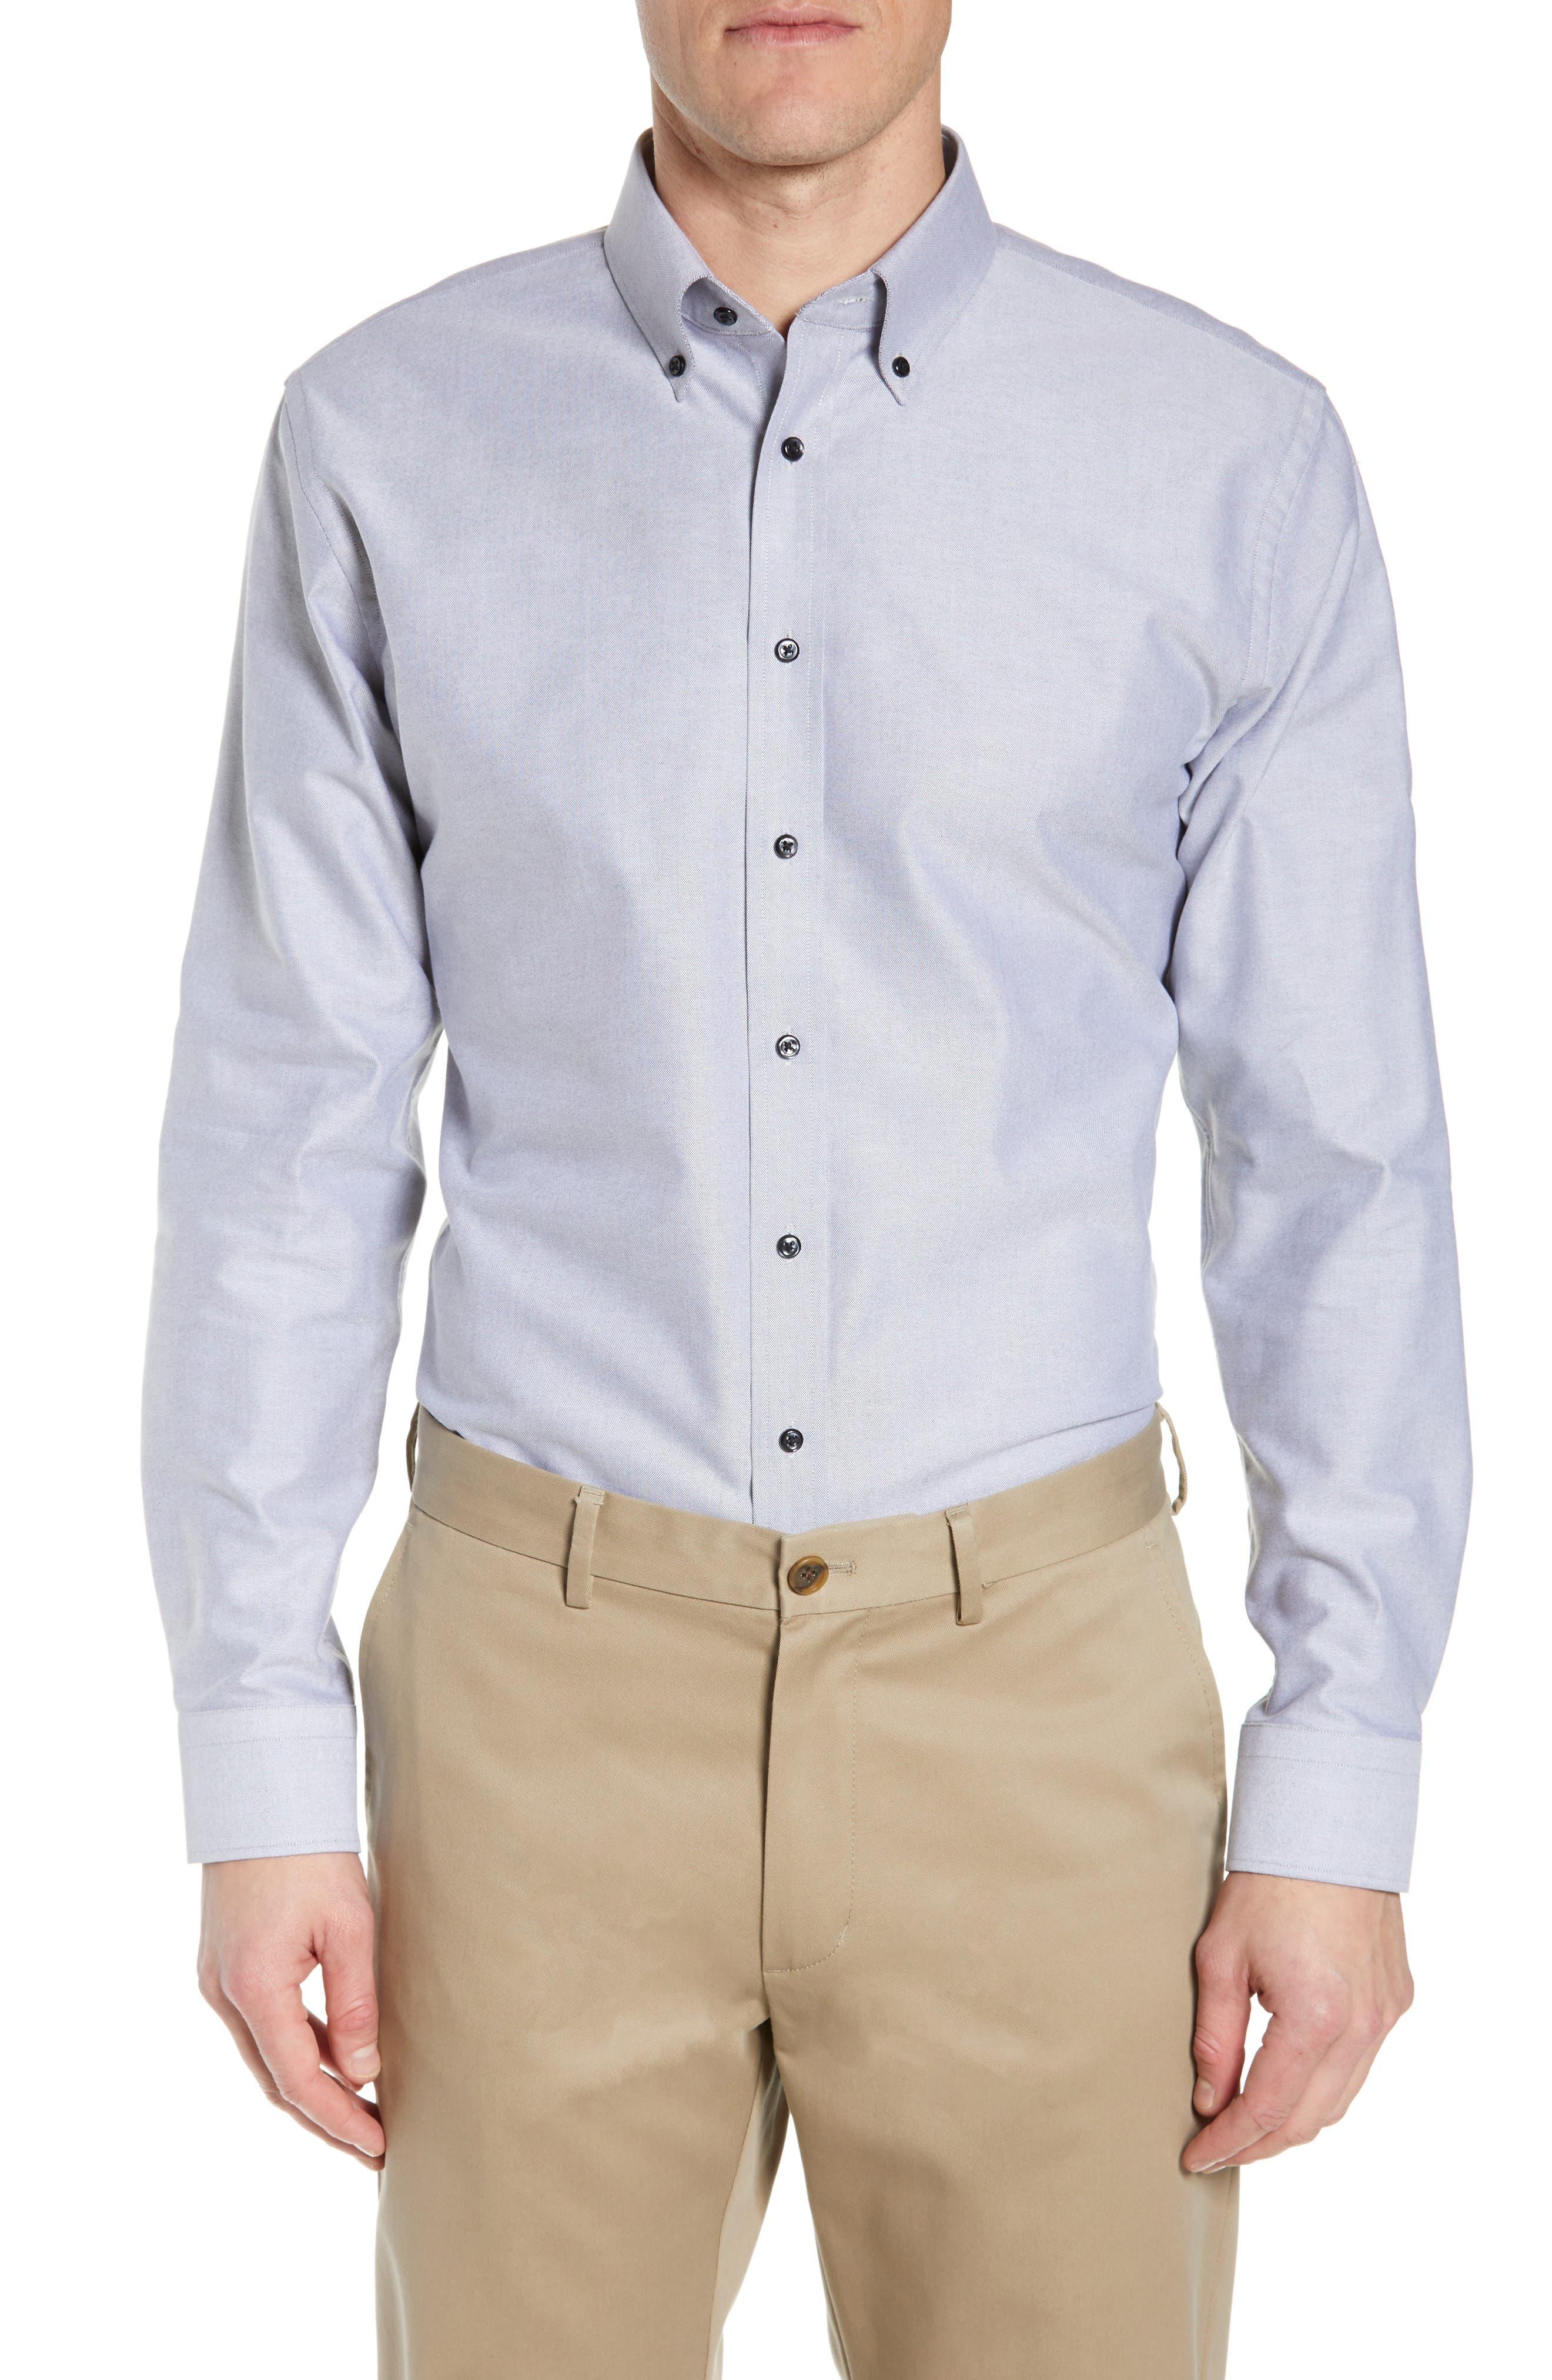 Trim Fit Oxford Dress Shirt,                             Main thumbnail 1, color,                             GREY FEATHER